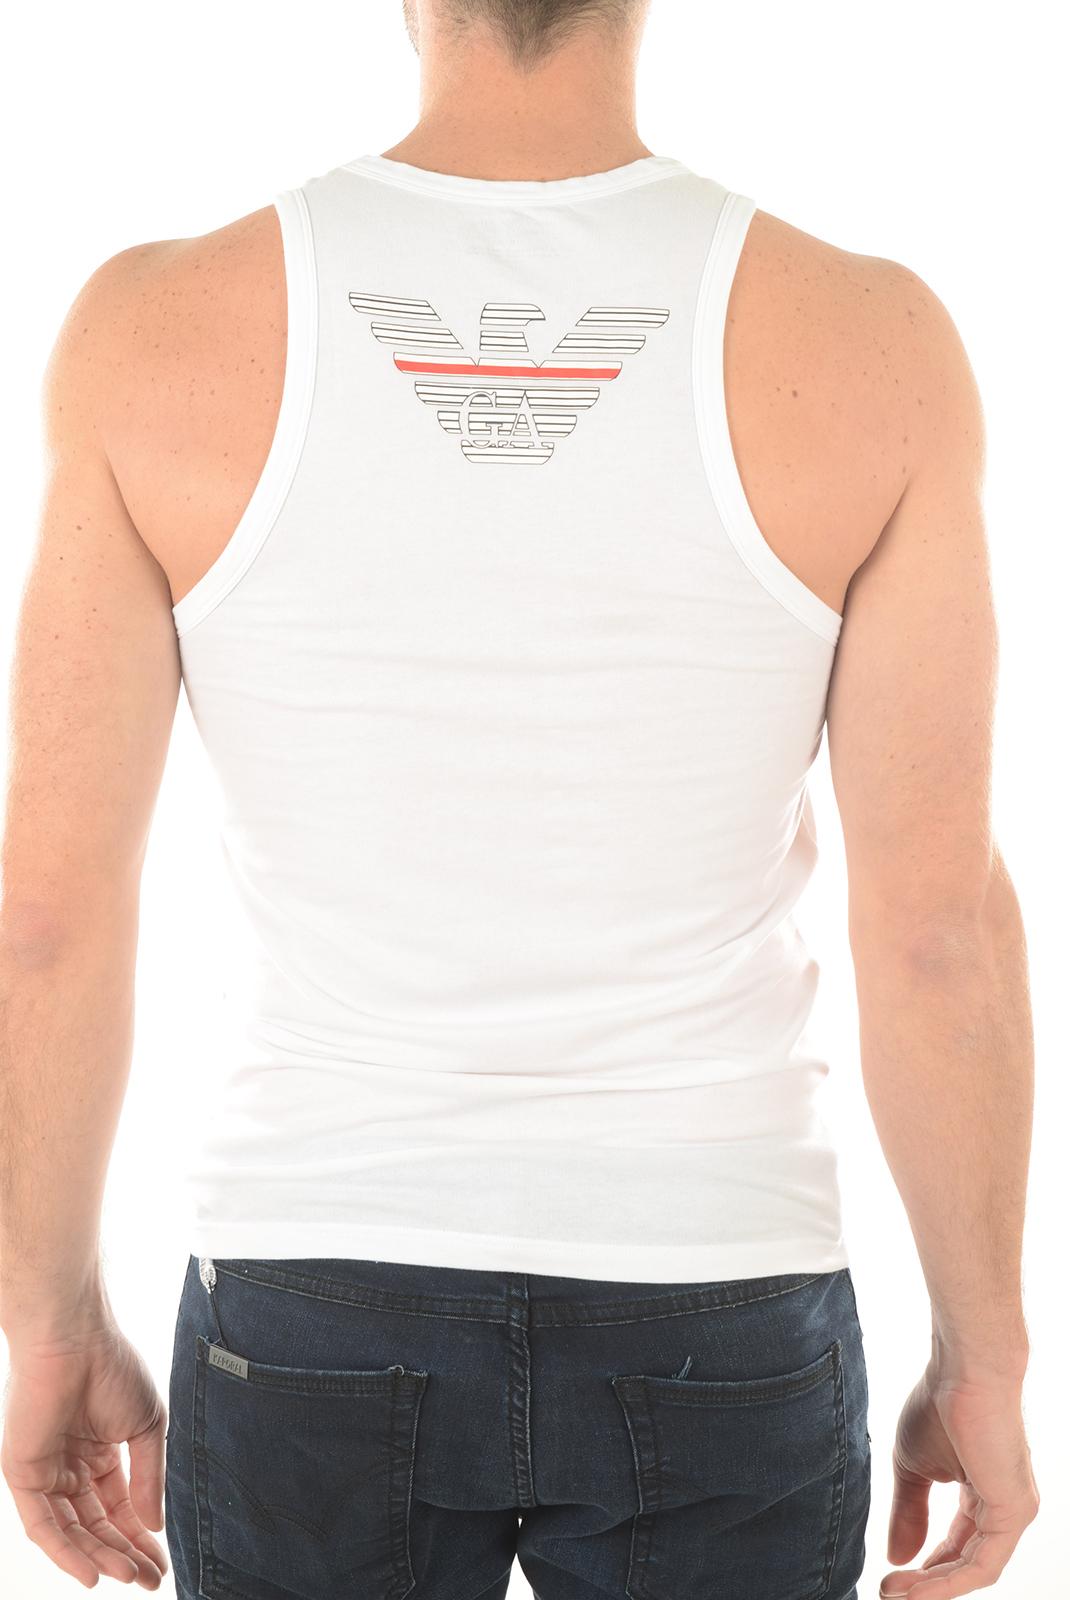 Débardeurs  Emporio armani 110828 6P725 10 blanc